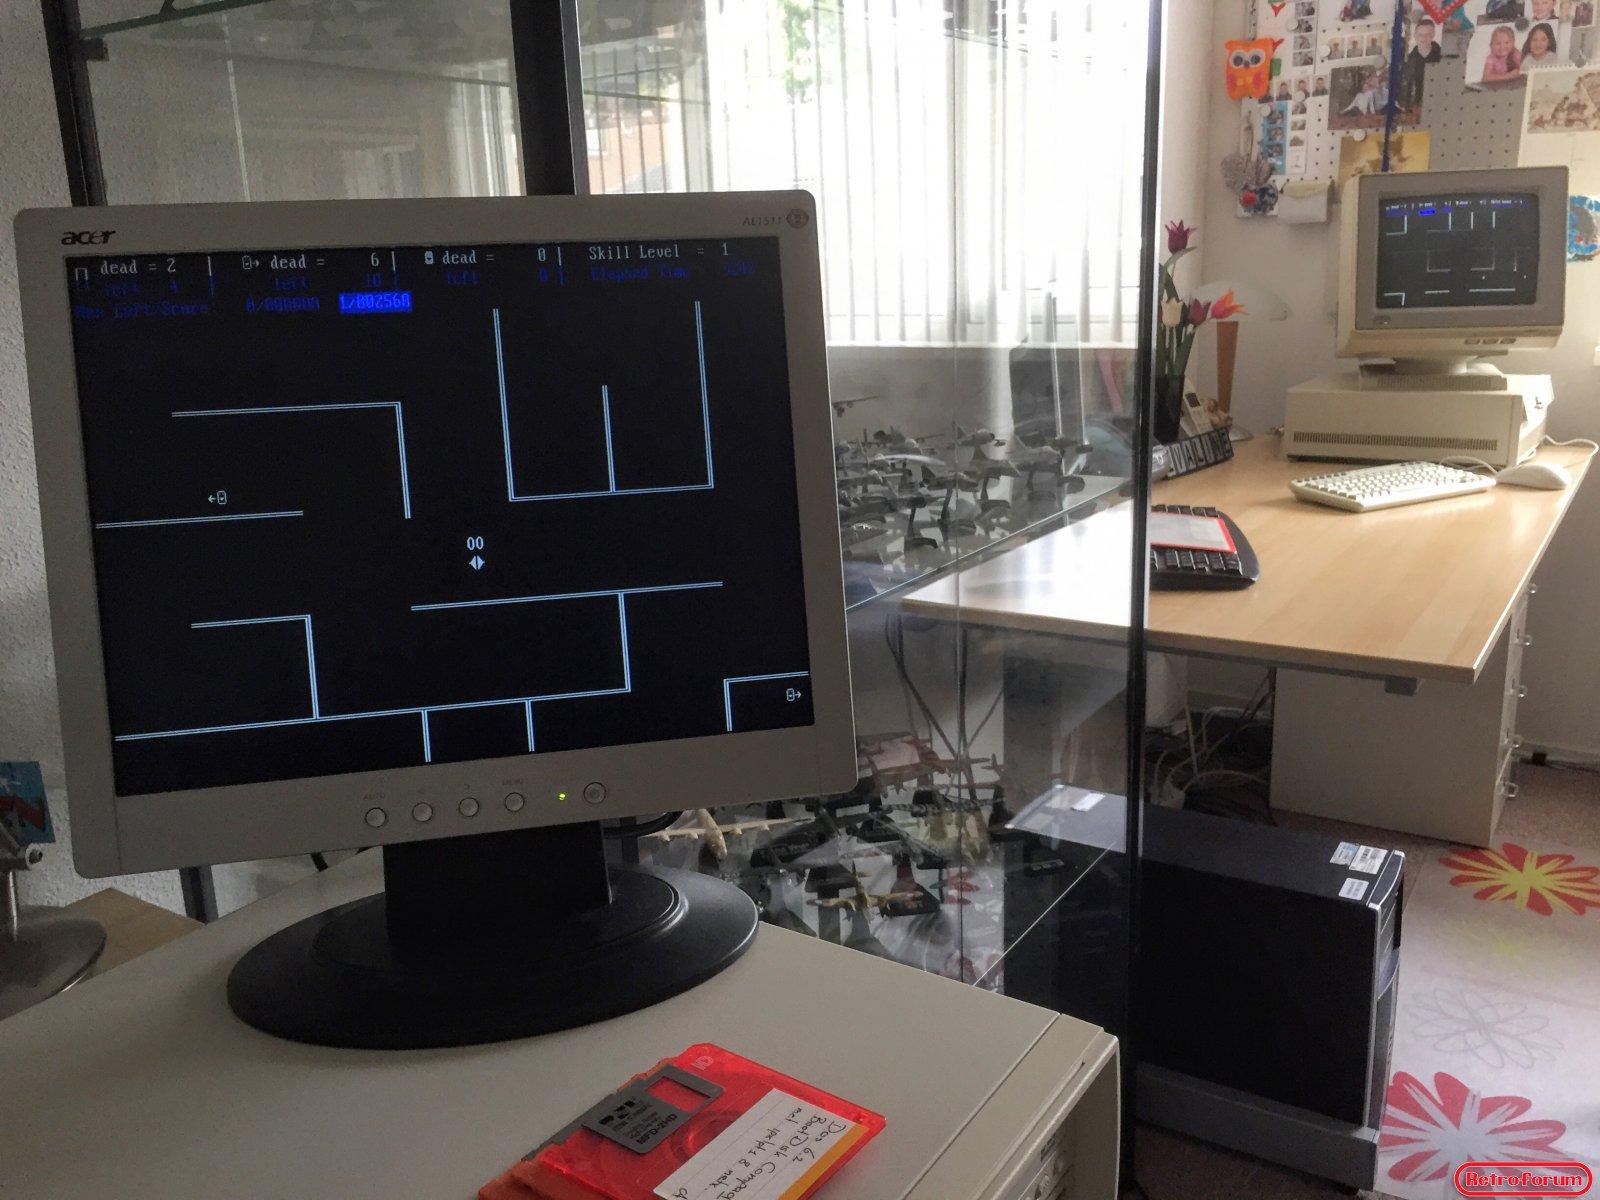 non-dedicated novell 2.2 met werkstation game